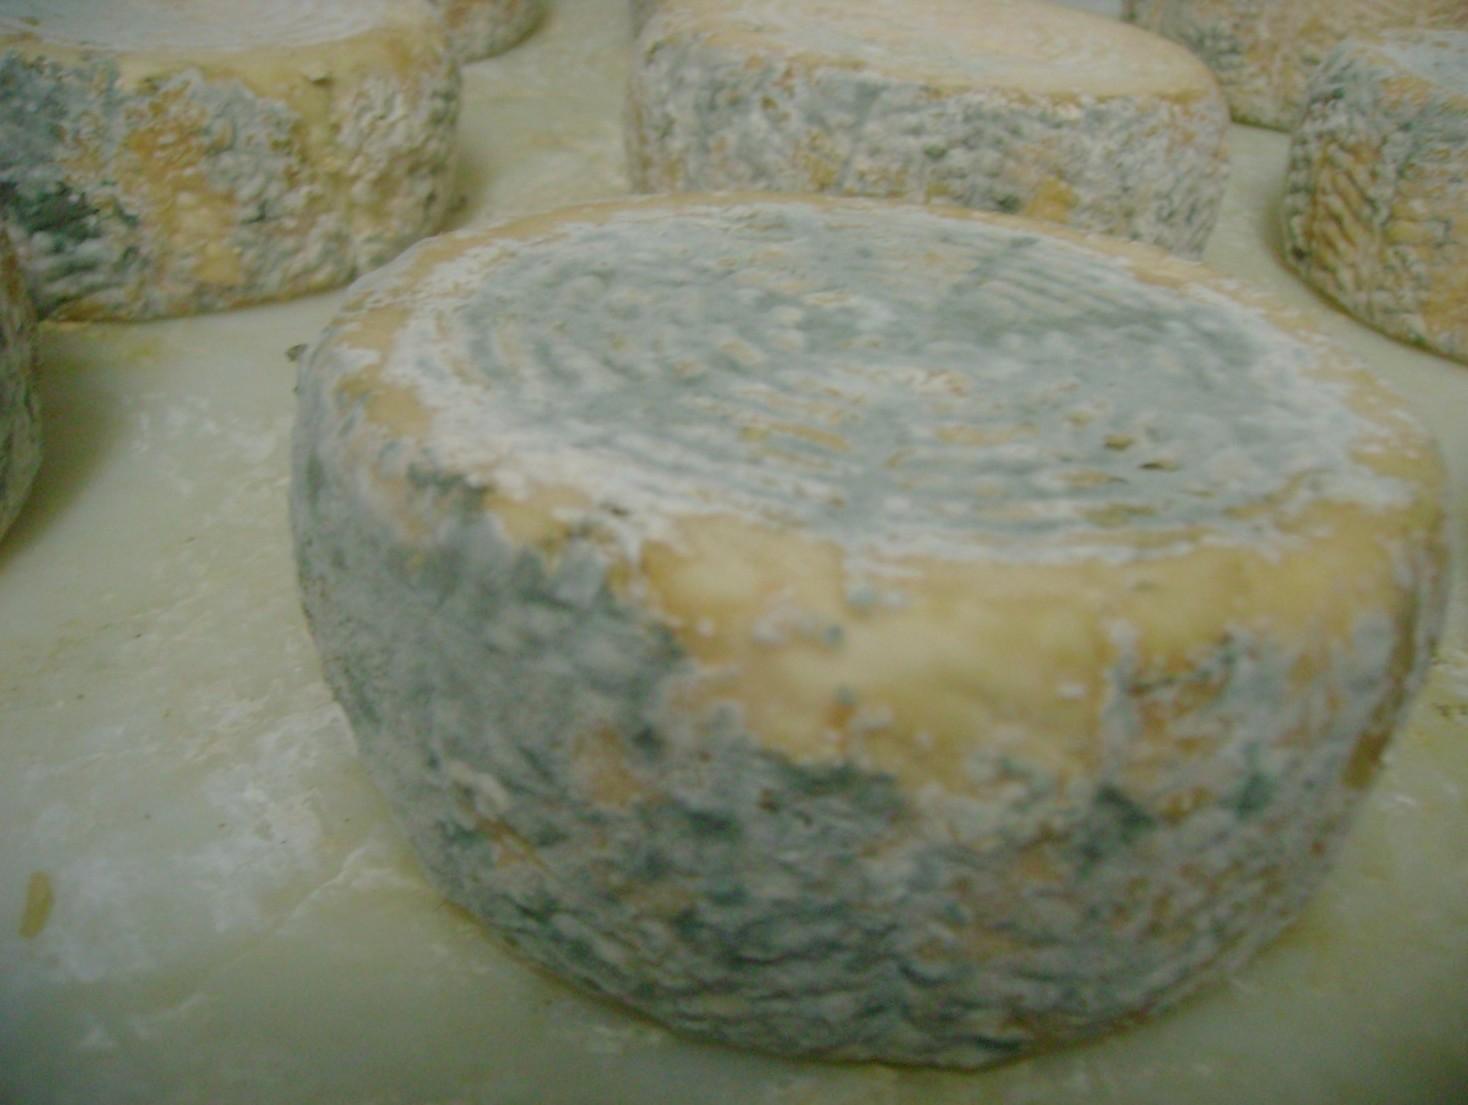 Muffe e ammoniaca formaggi infetti: bloc